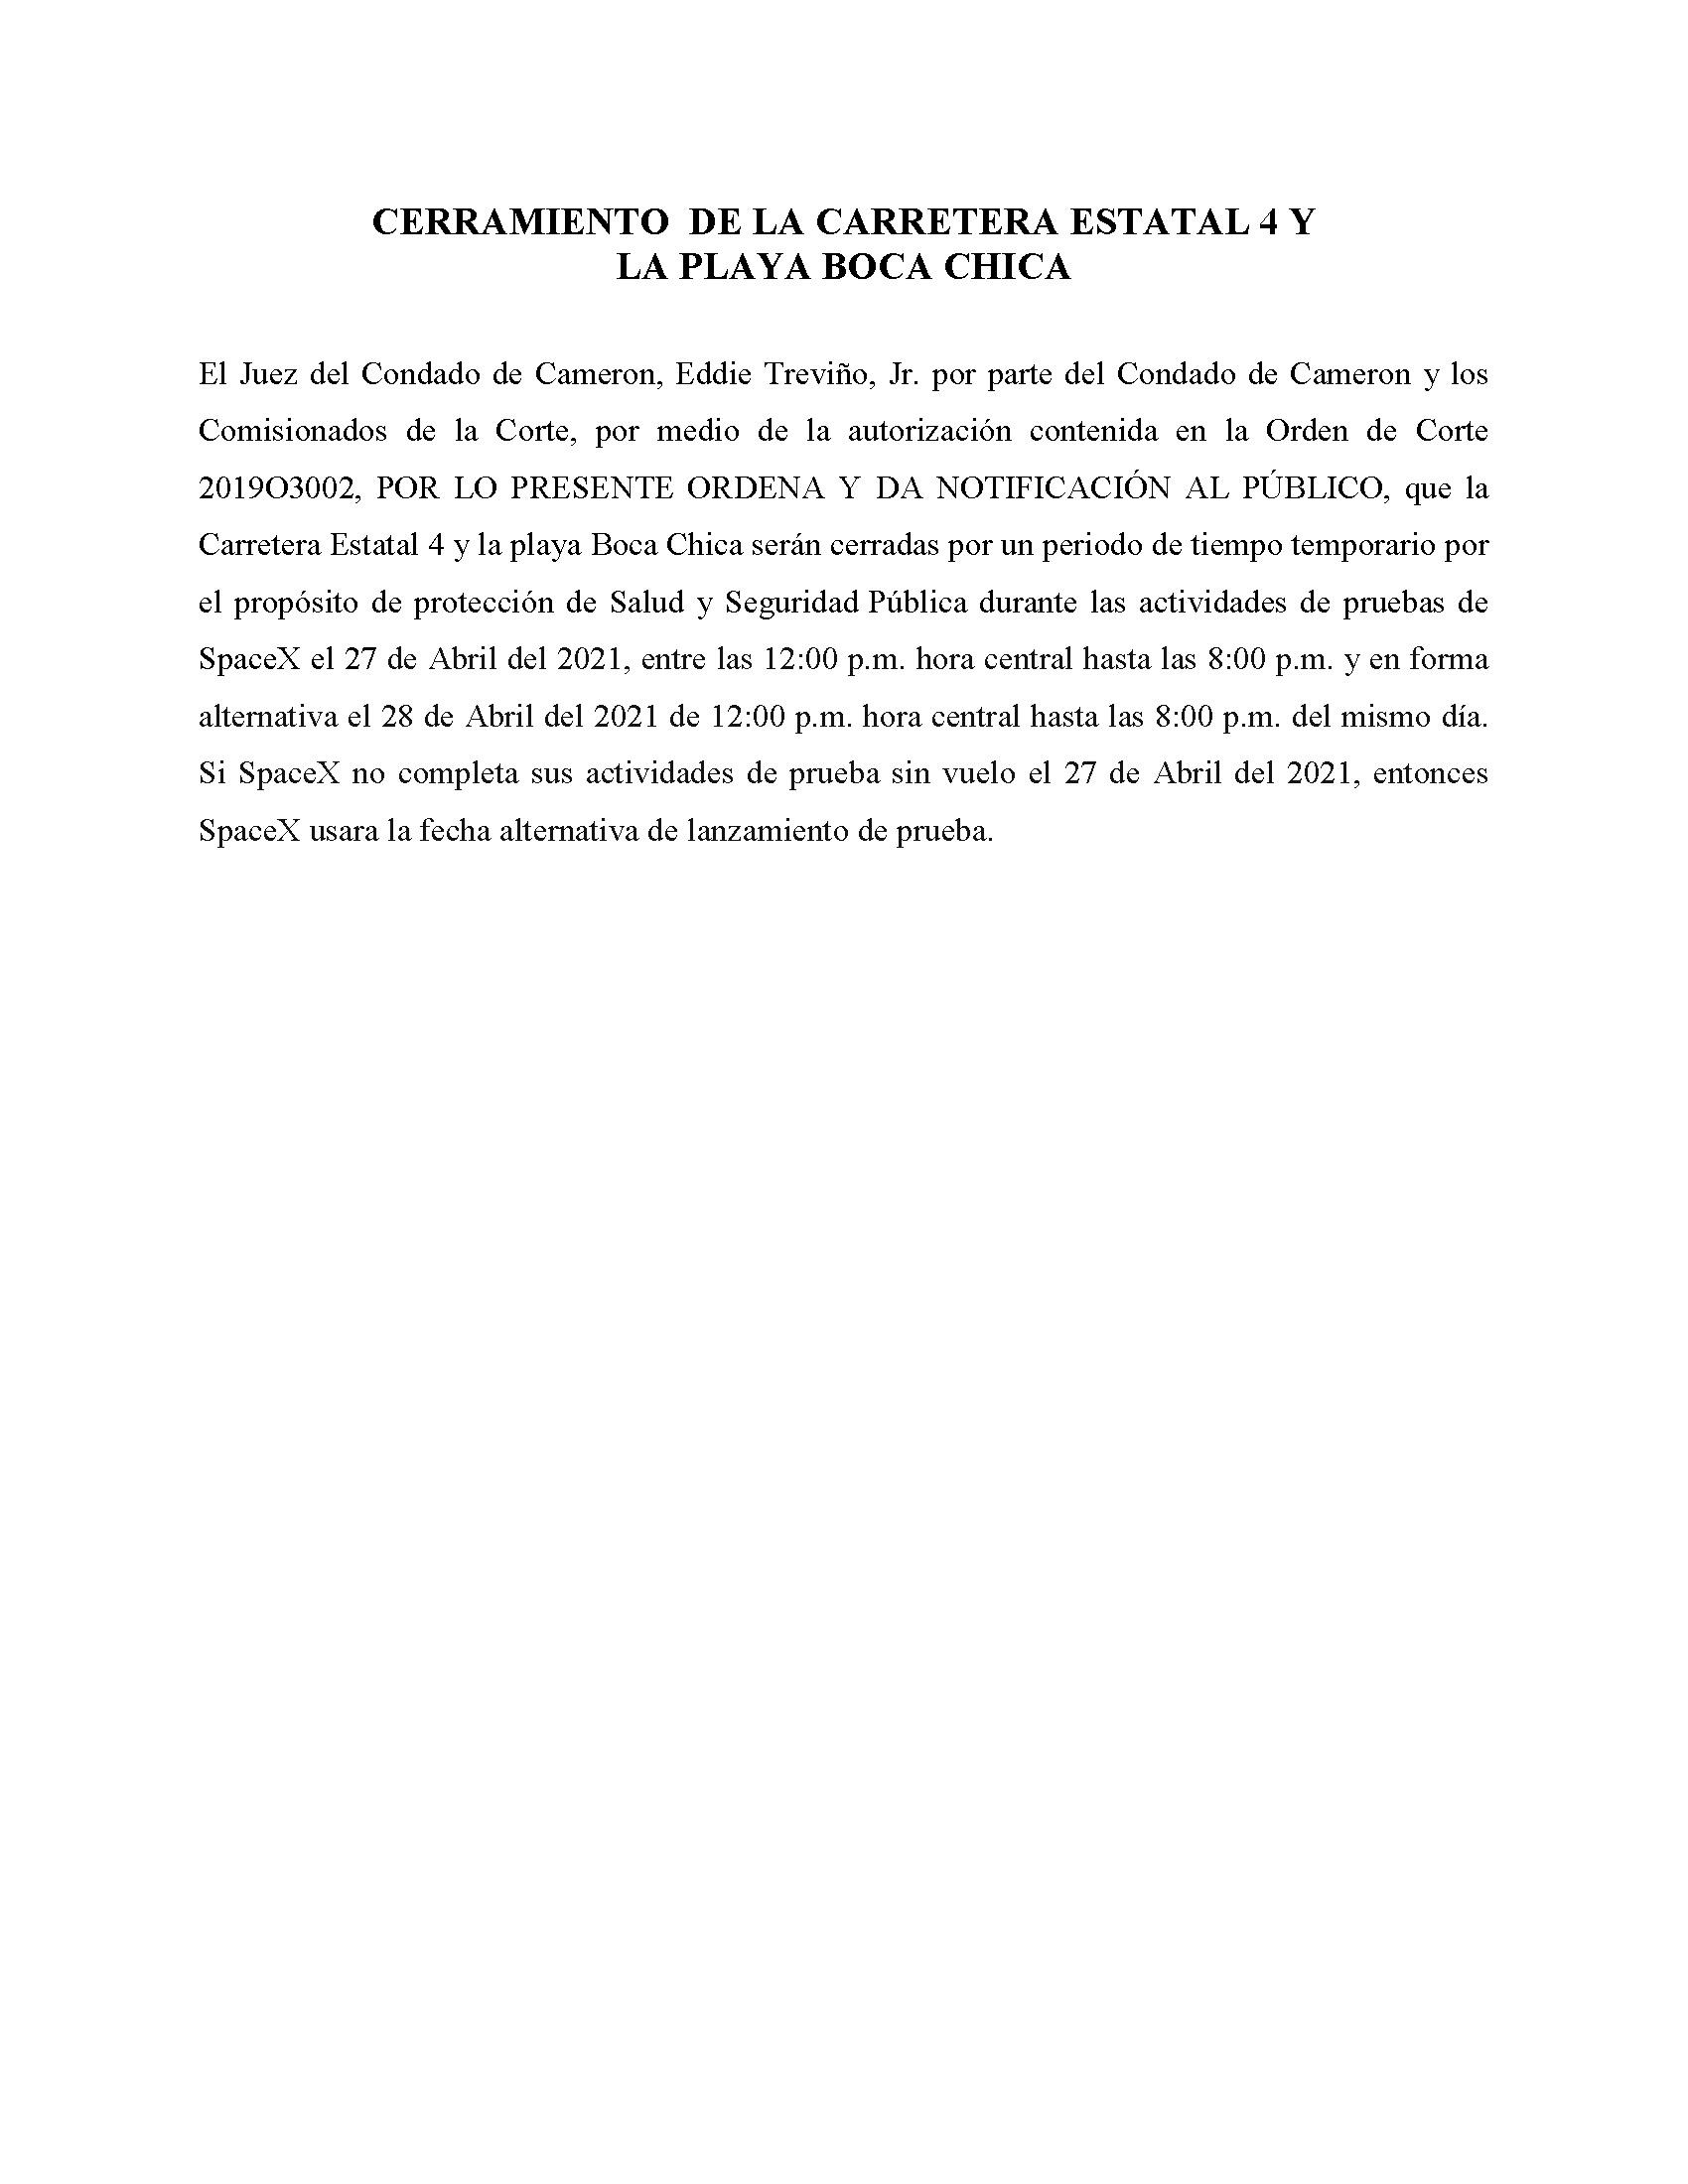 ORDER.CLOSURE OF HIGHWAY 4 Y LA PLAYA BOCA CHICA.SPANISH.04.27.2021